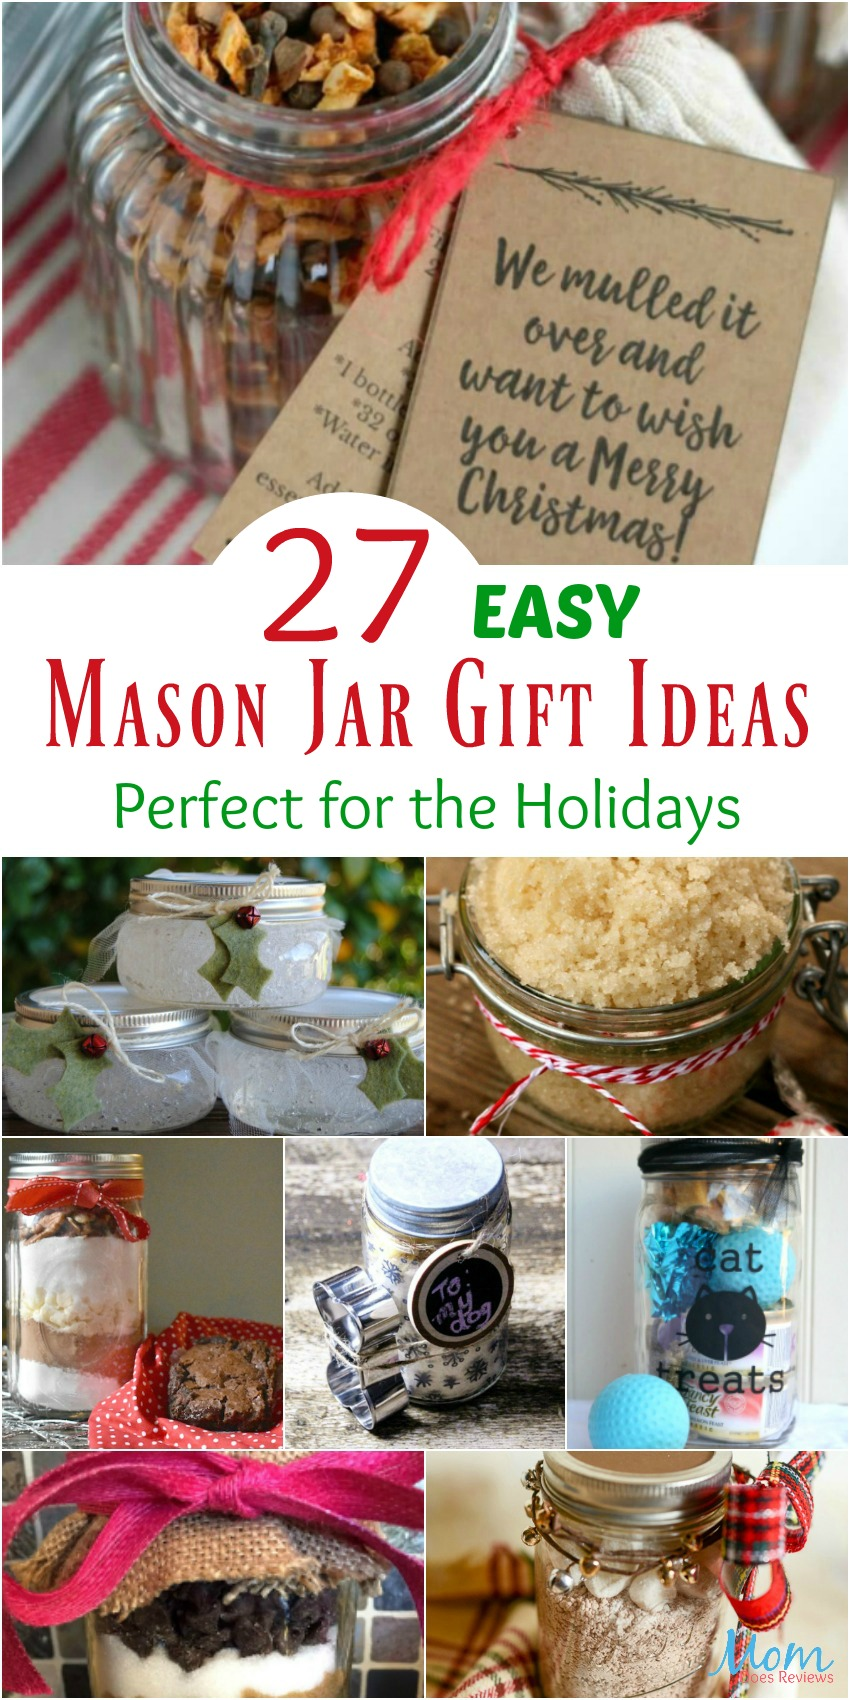 27 Easy Mason Jar Gift Ideas Perfect for the Holidays #gifts #christmas #masonjargifts #merrychristmas